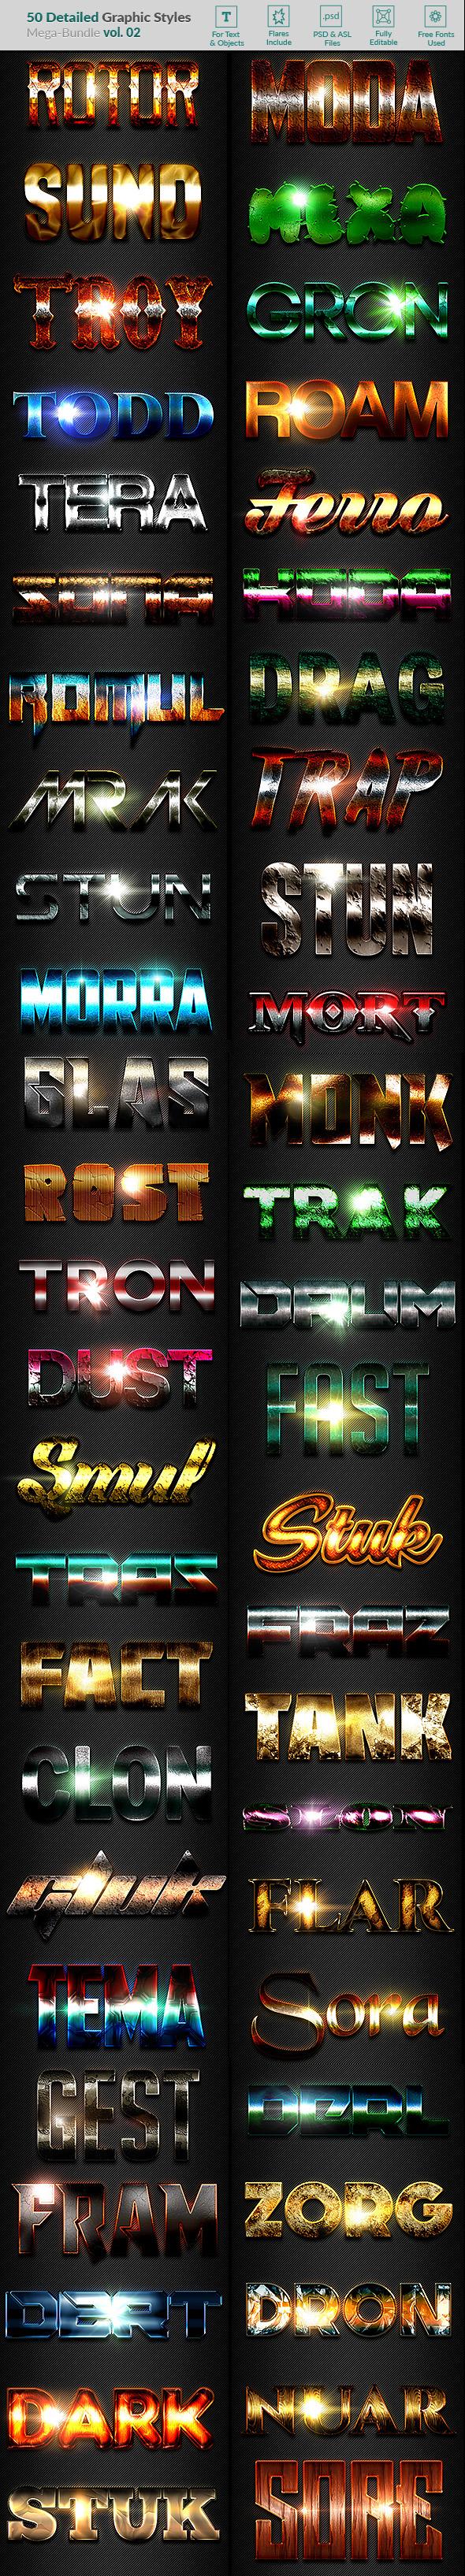 50 Text Effects - Bundle Vol. 02 - Styles Photoshop